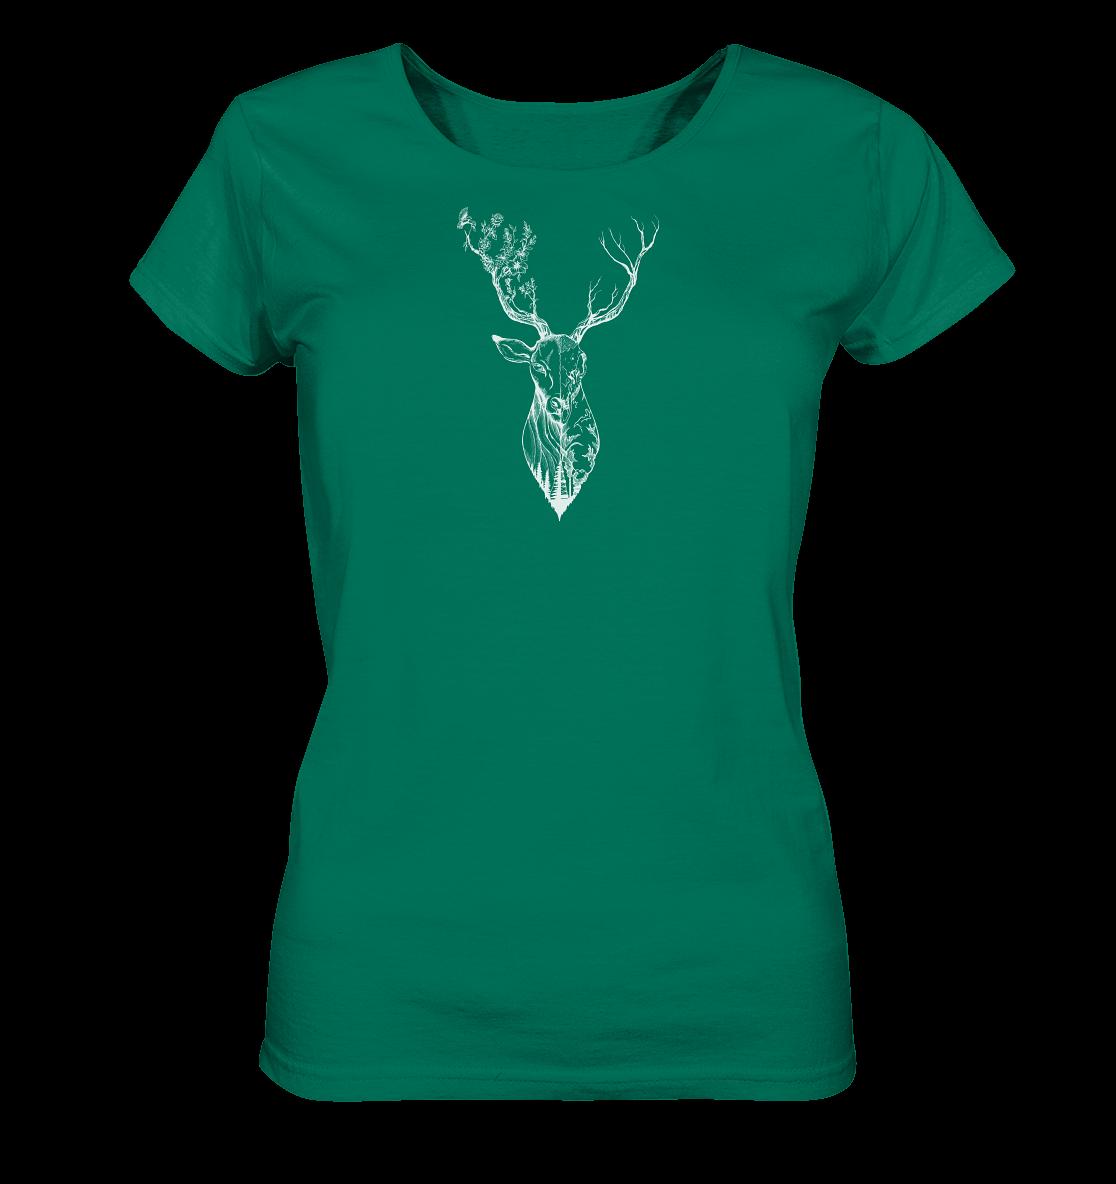 front-ladies-organic-shirt-00745b-1116x-6.png